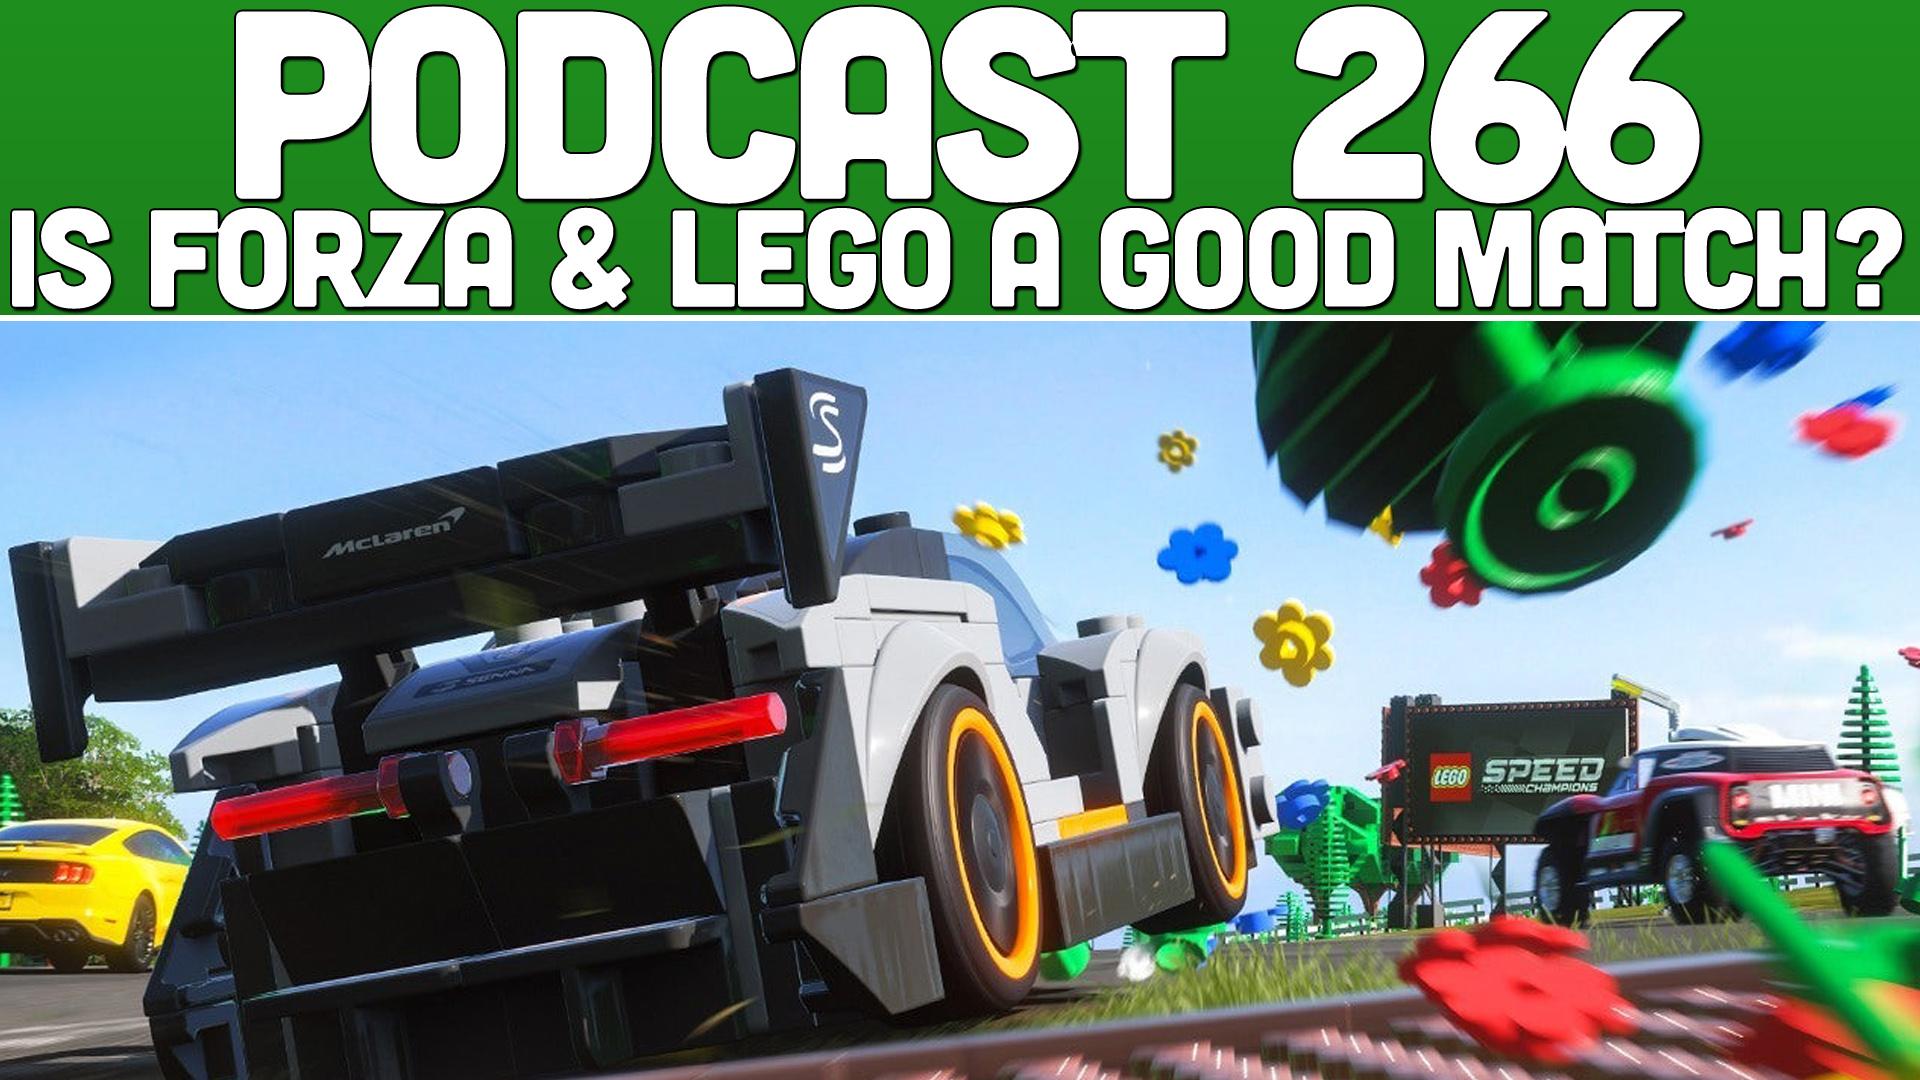 Podcast 266: Is Forza & Lego a Good Match? — XONEBROS